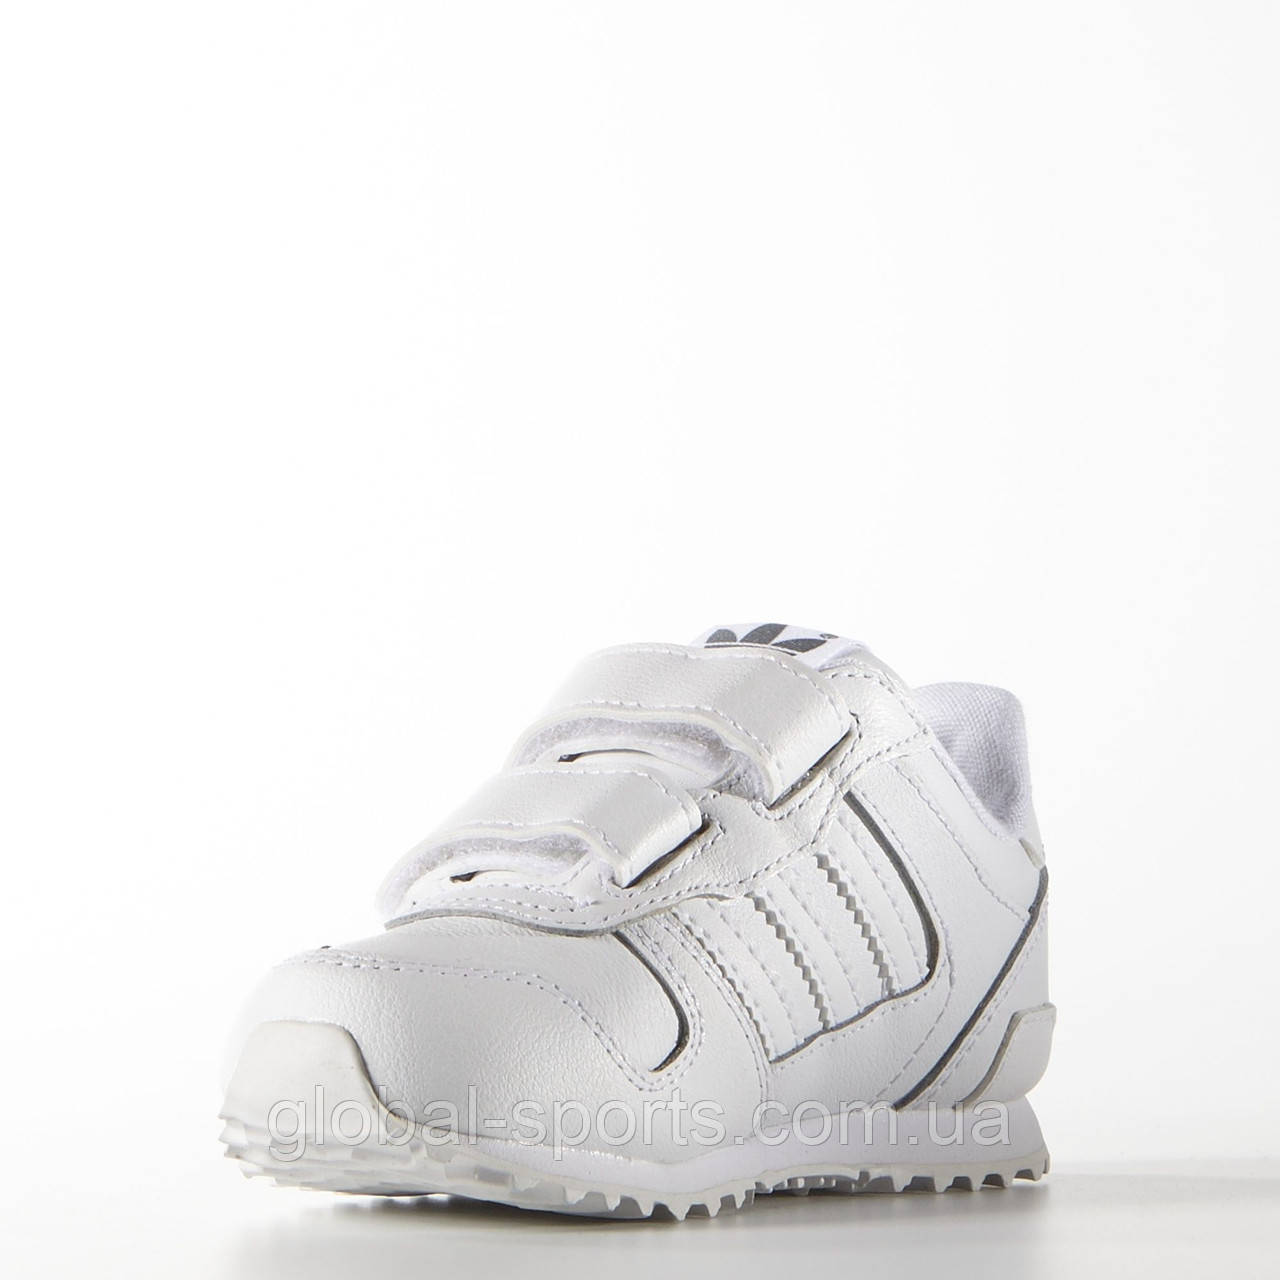 7d58ca90 Детские Кроссовки Adidas ZX700 KIDS, (Артикул: Q23981) - магазин Global  Sport в